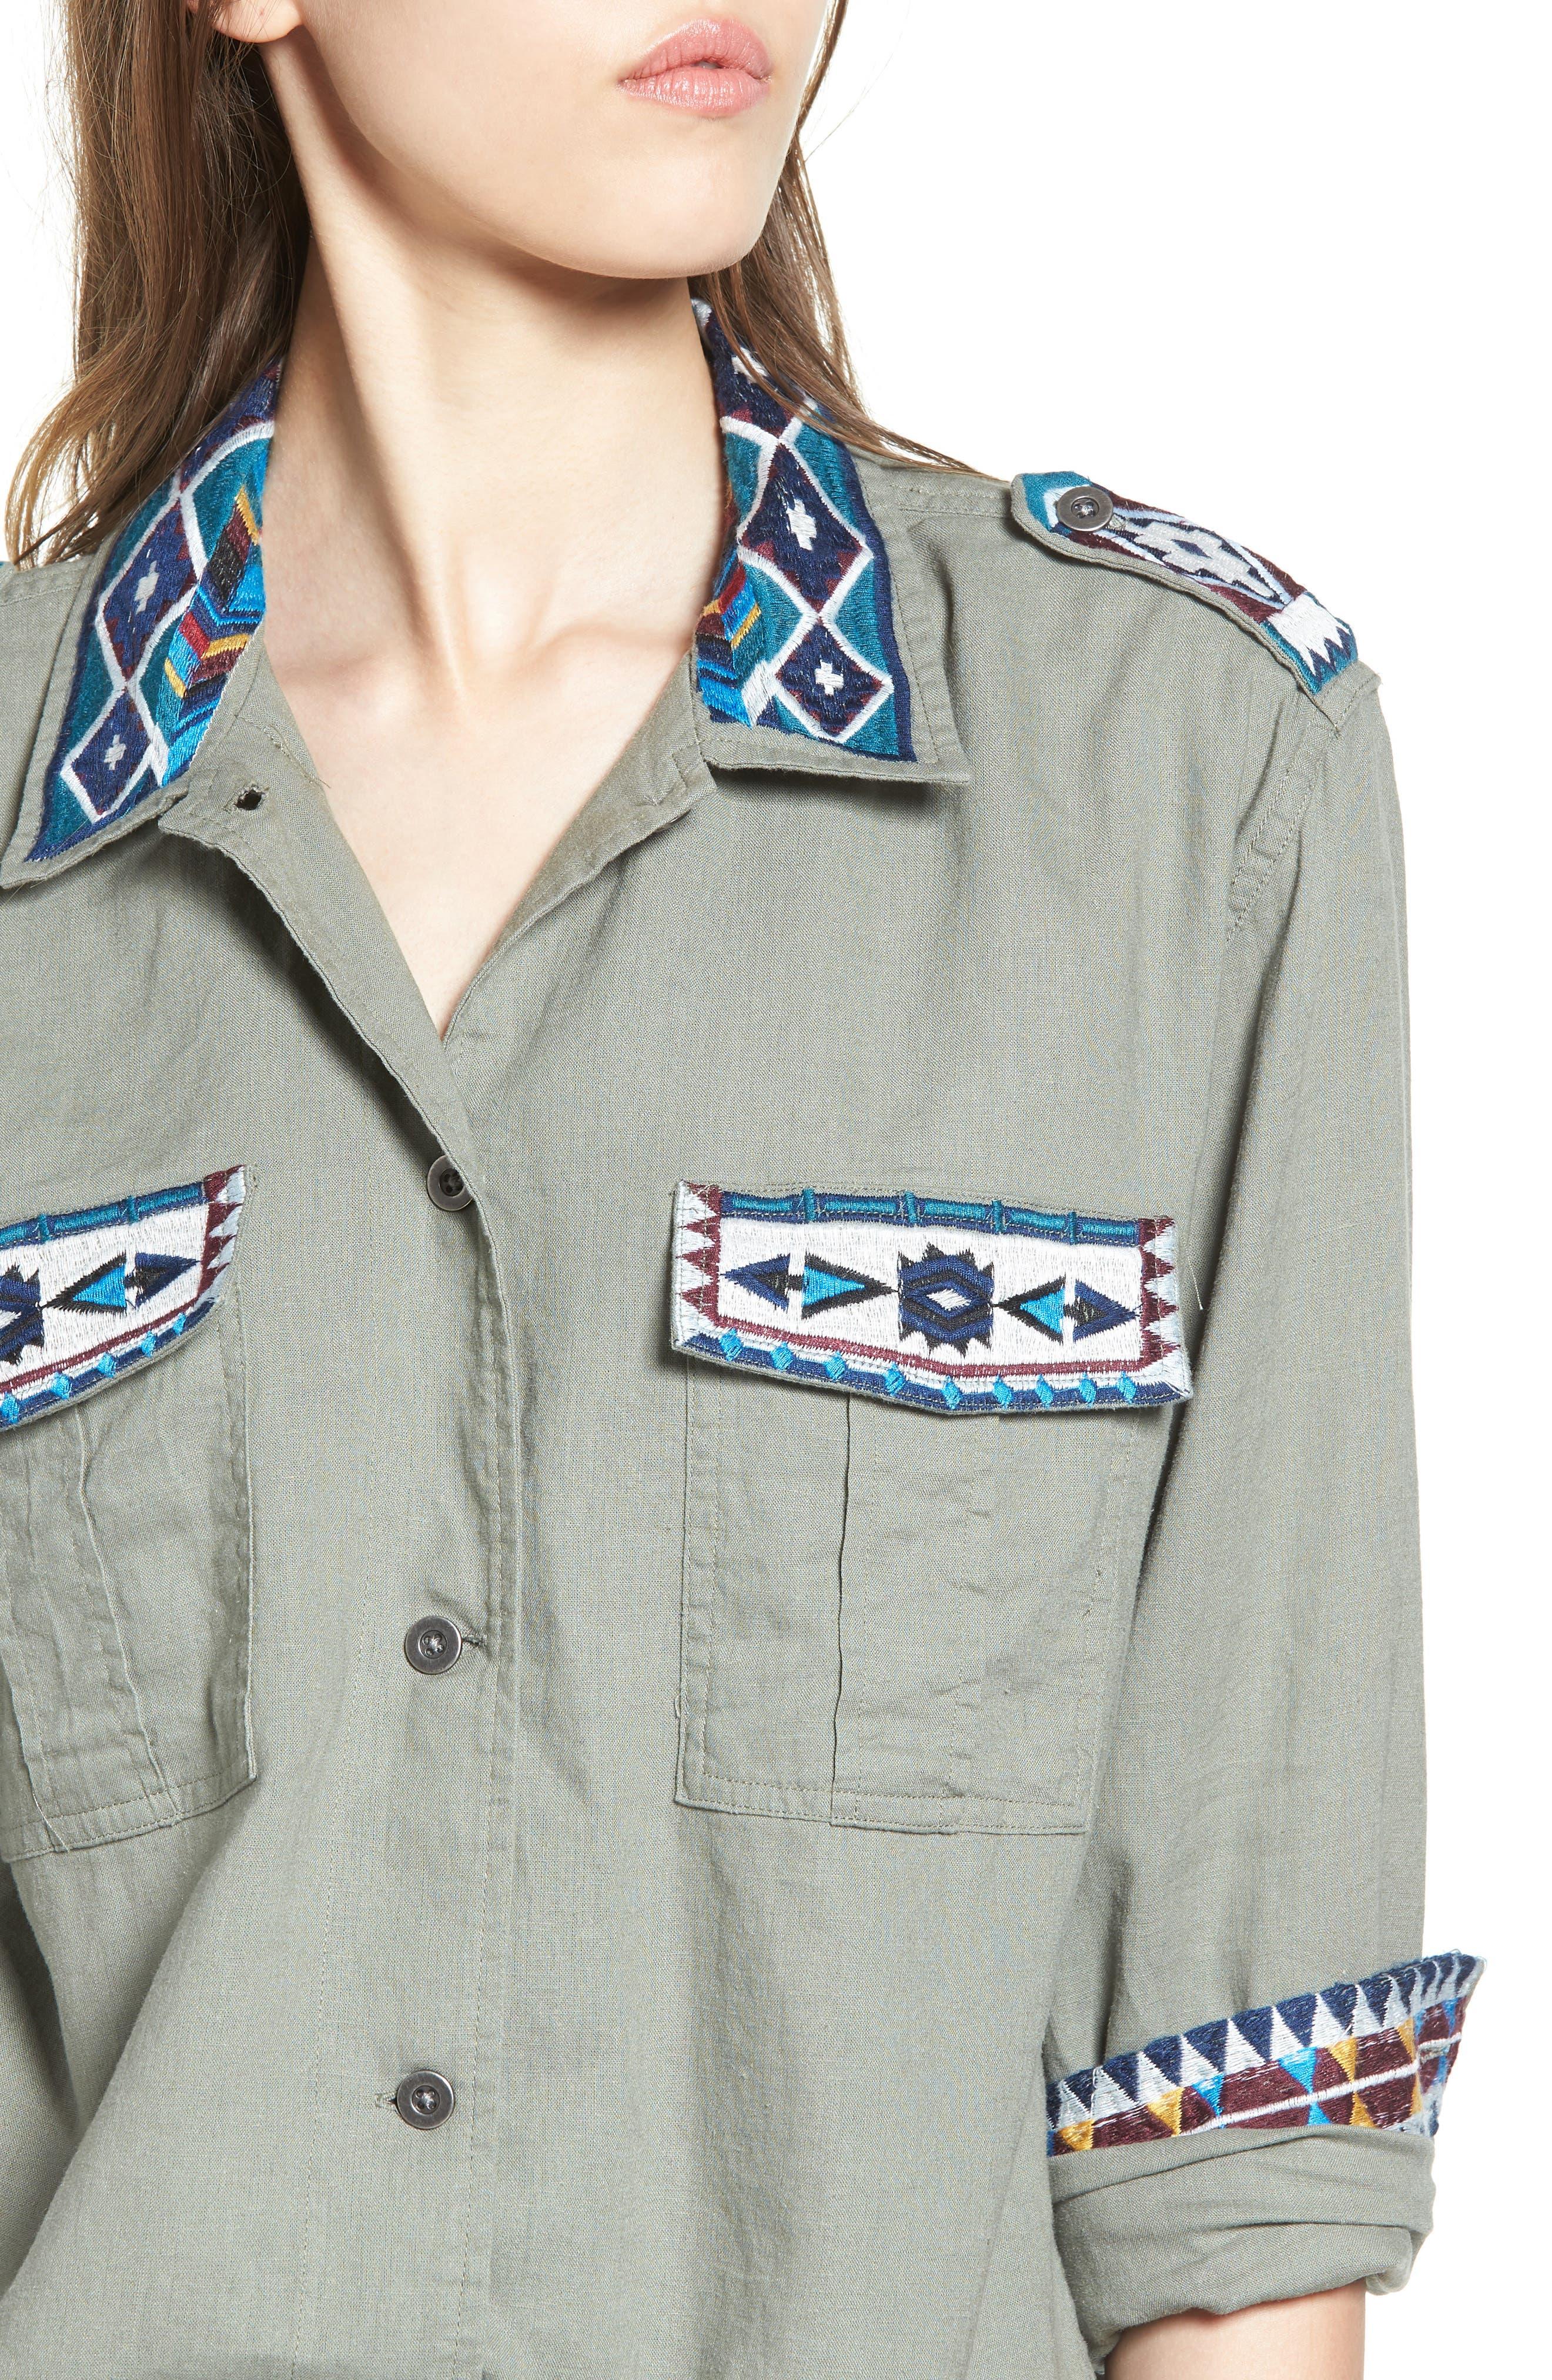 Kona Embroidered Shirt,                             Alternate thumbnail 4, color,                             320